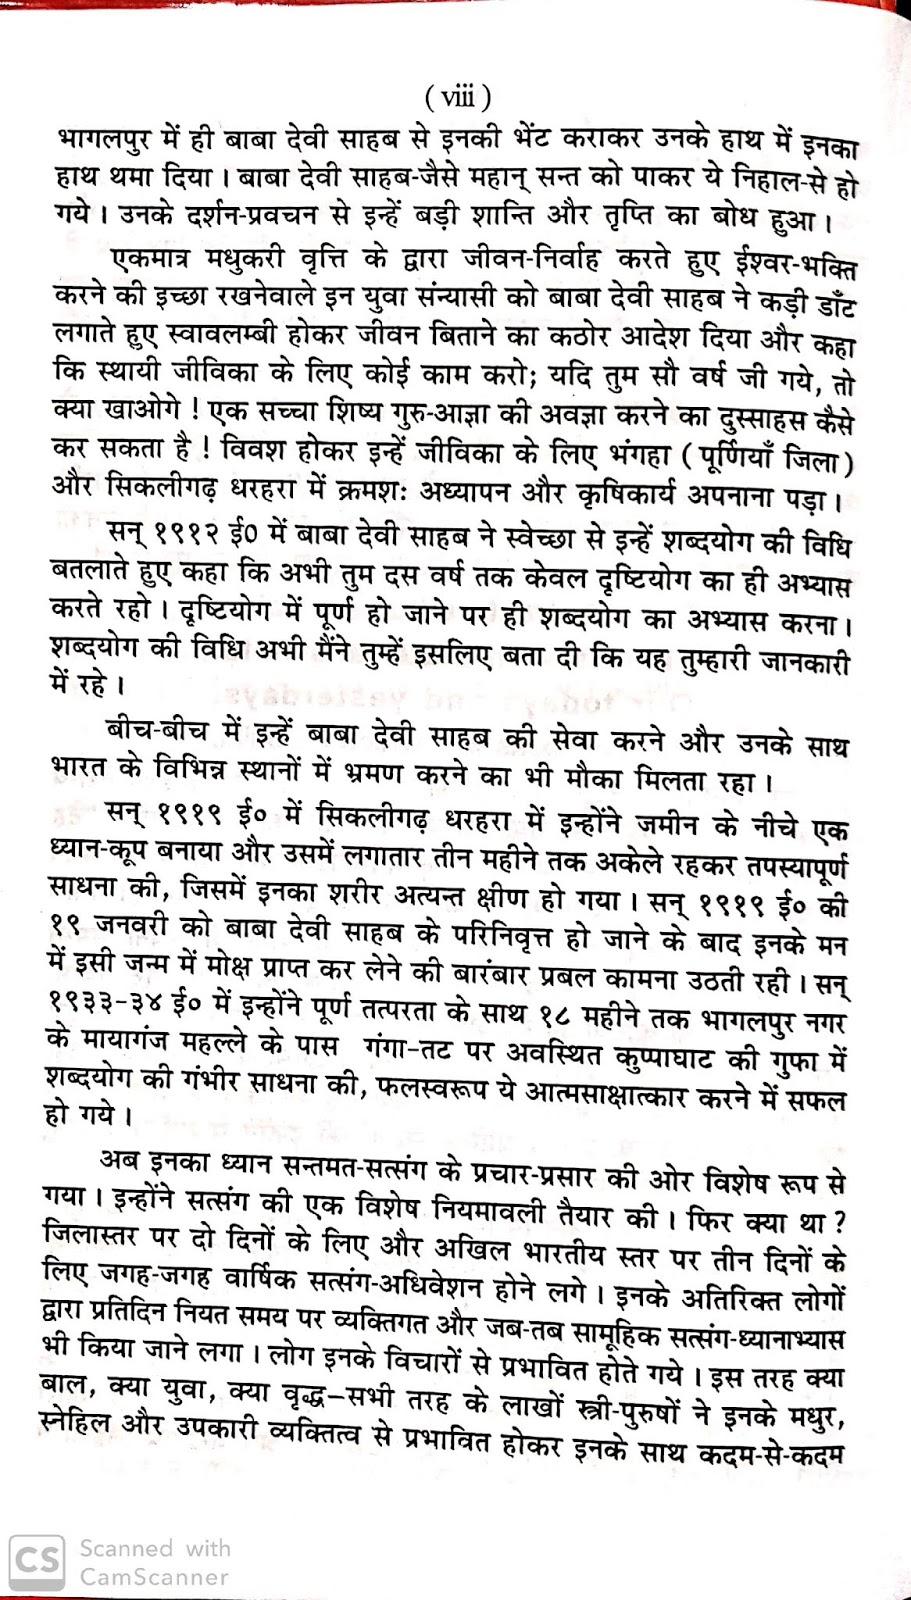 सद्गुरु महर्षि मेंहीं परमहंस जी महाराज एक परिचय Paramahansa ji is an introduction to Sadguru Maharshi , महर्षि मेंहीं परिचय चित्र 3